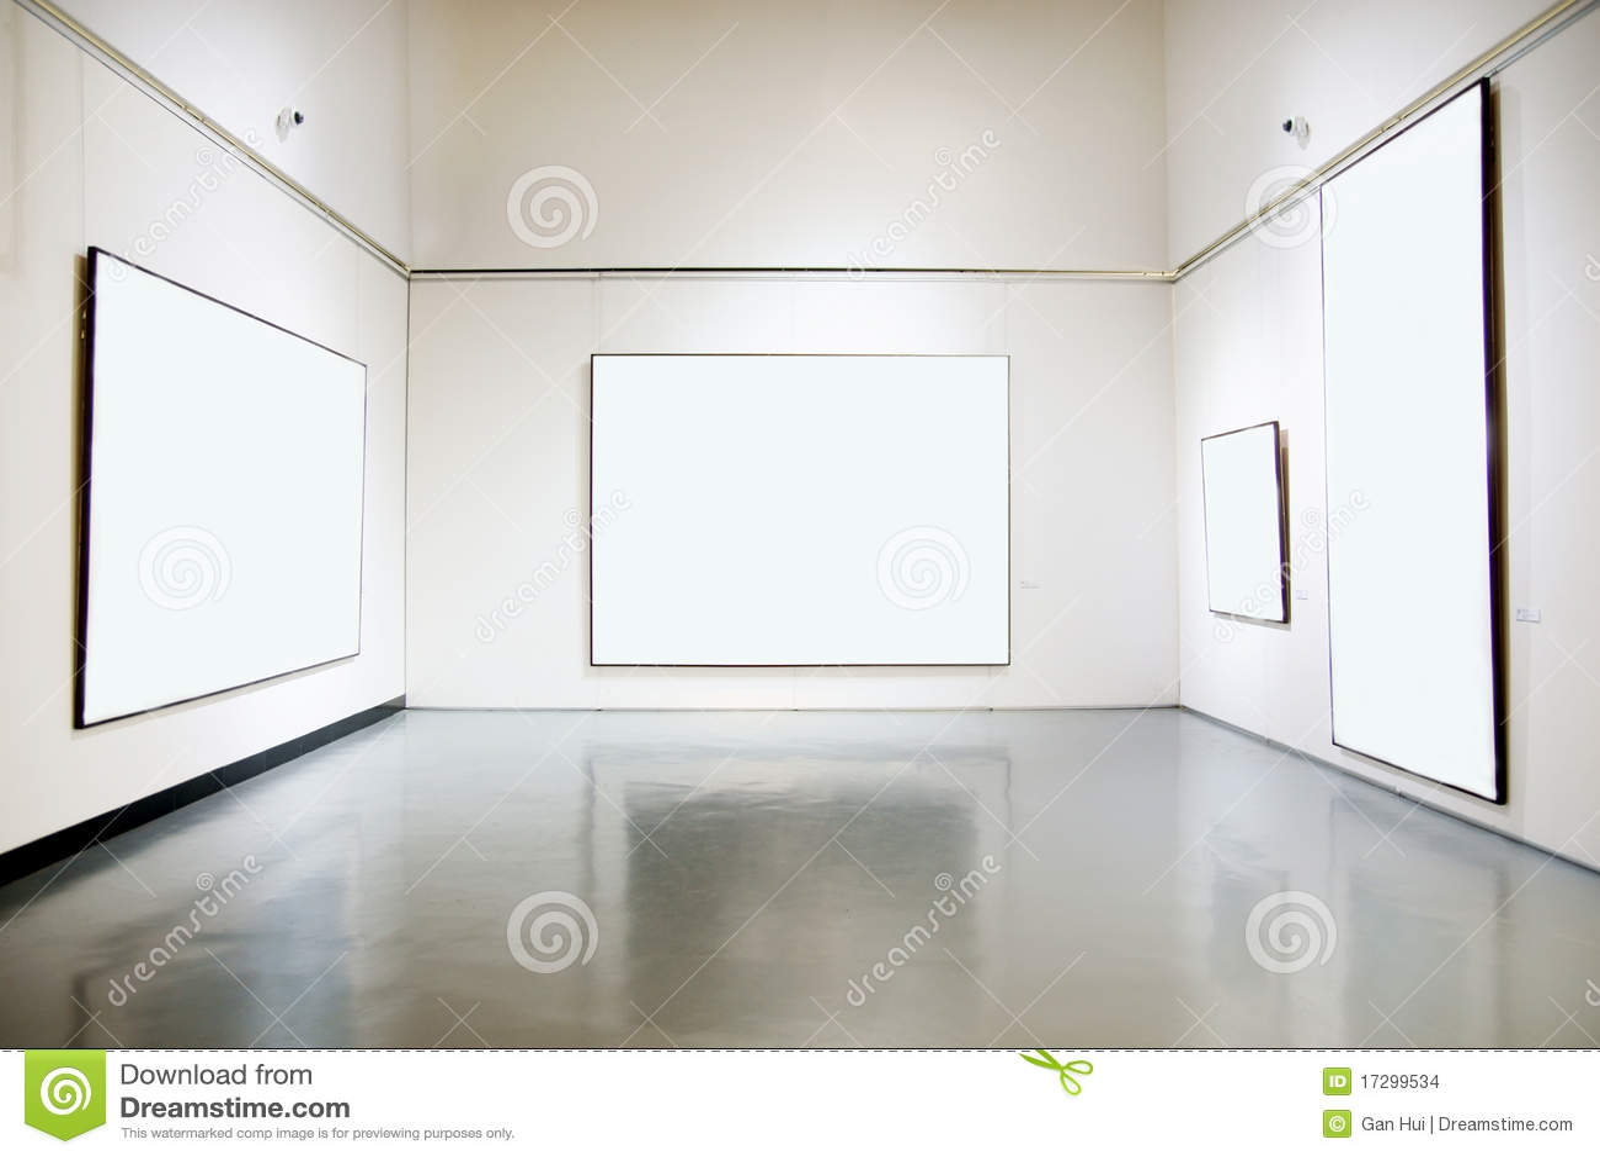 hall d 39 exposition de galerie d 39 art images stock image 17299534. Black Bedroom Furniture Sets. Home Design Ideas